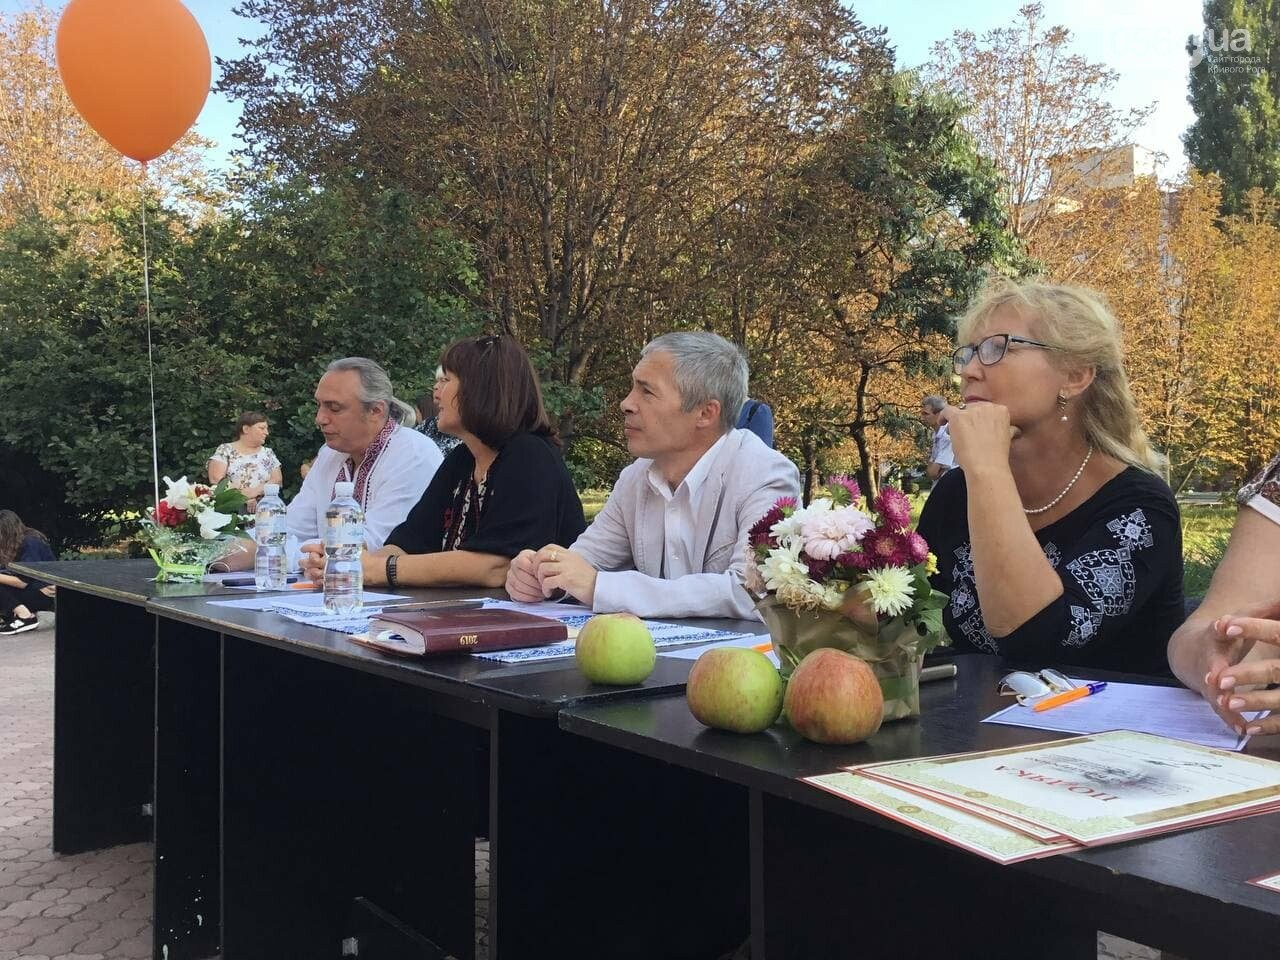 18 конкурсантов представили своё творчество на 5-м Криворожском фестивале имени Кузьмы Скрябина, - ФОТО, ВИДЕО, фото-1